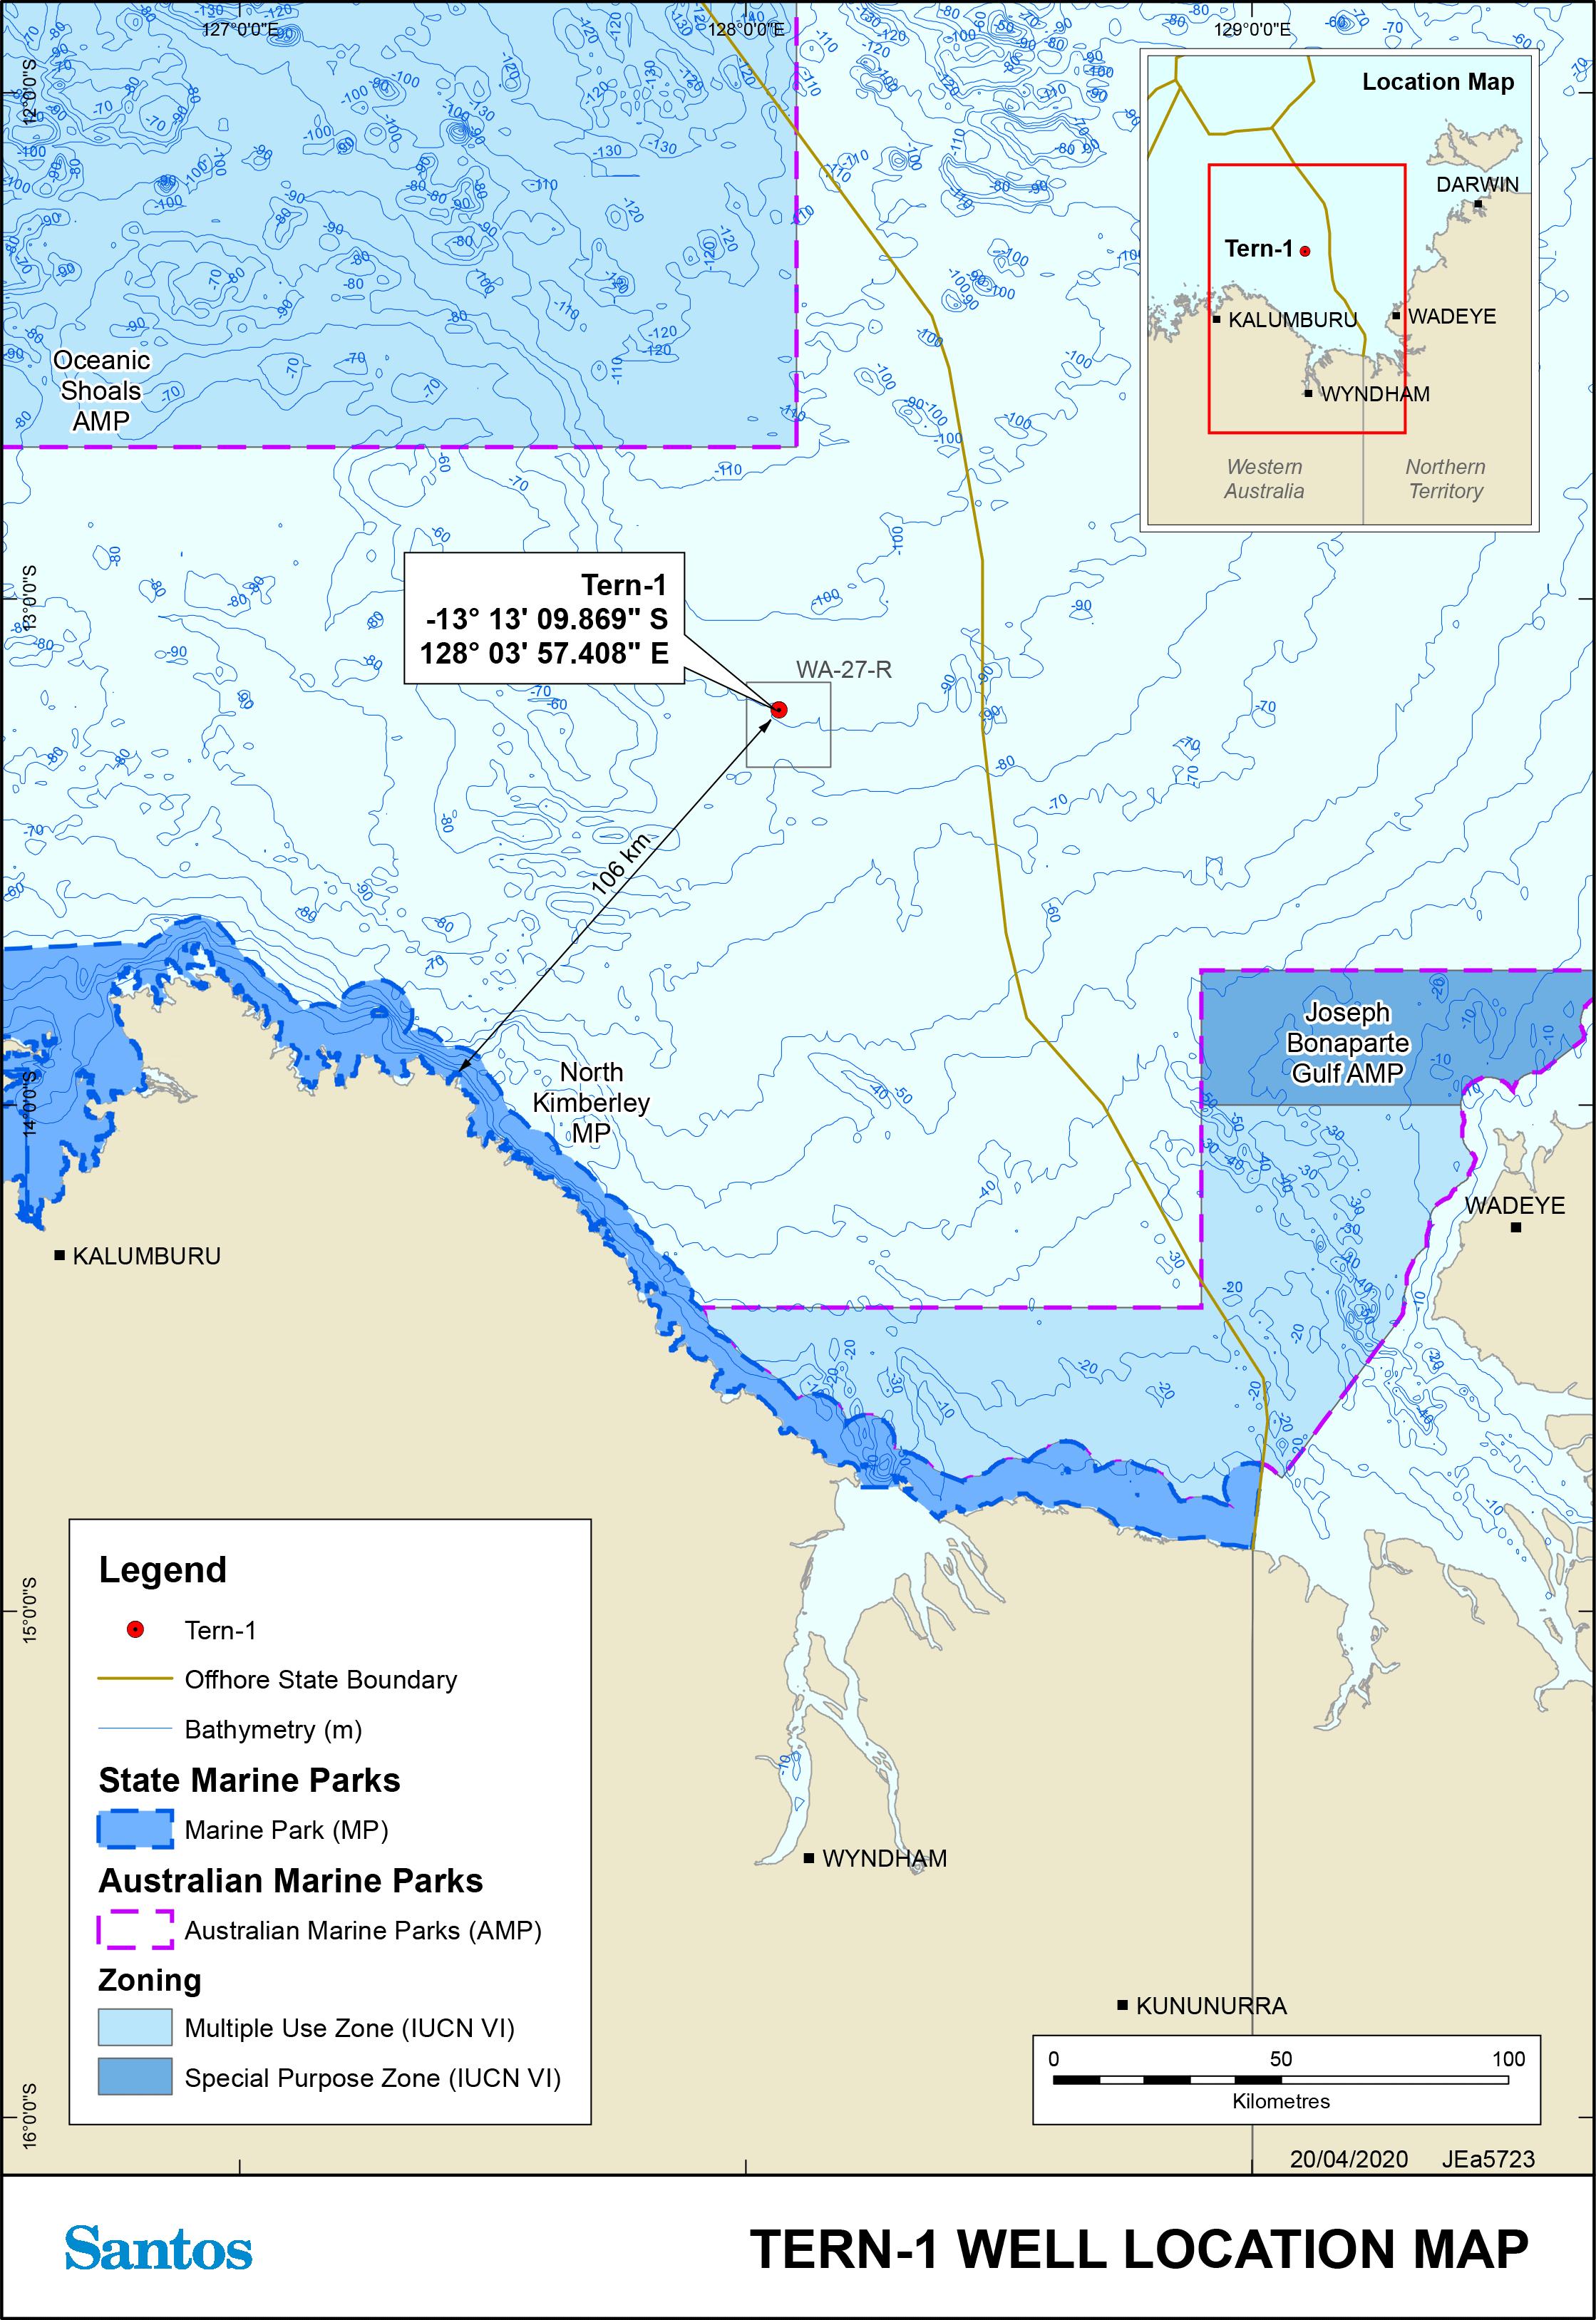 Location map - Activity: Santos Tern-1 Wellhead Abandonment (refer to description)